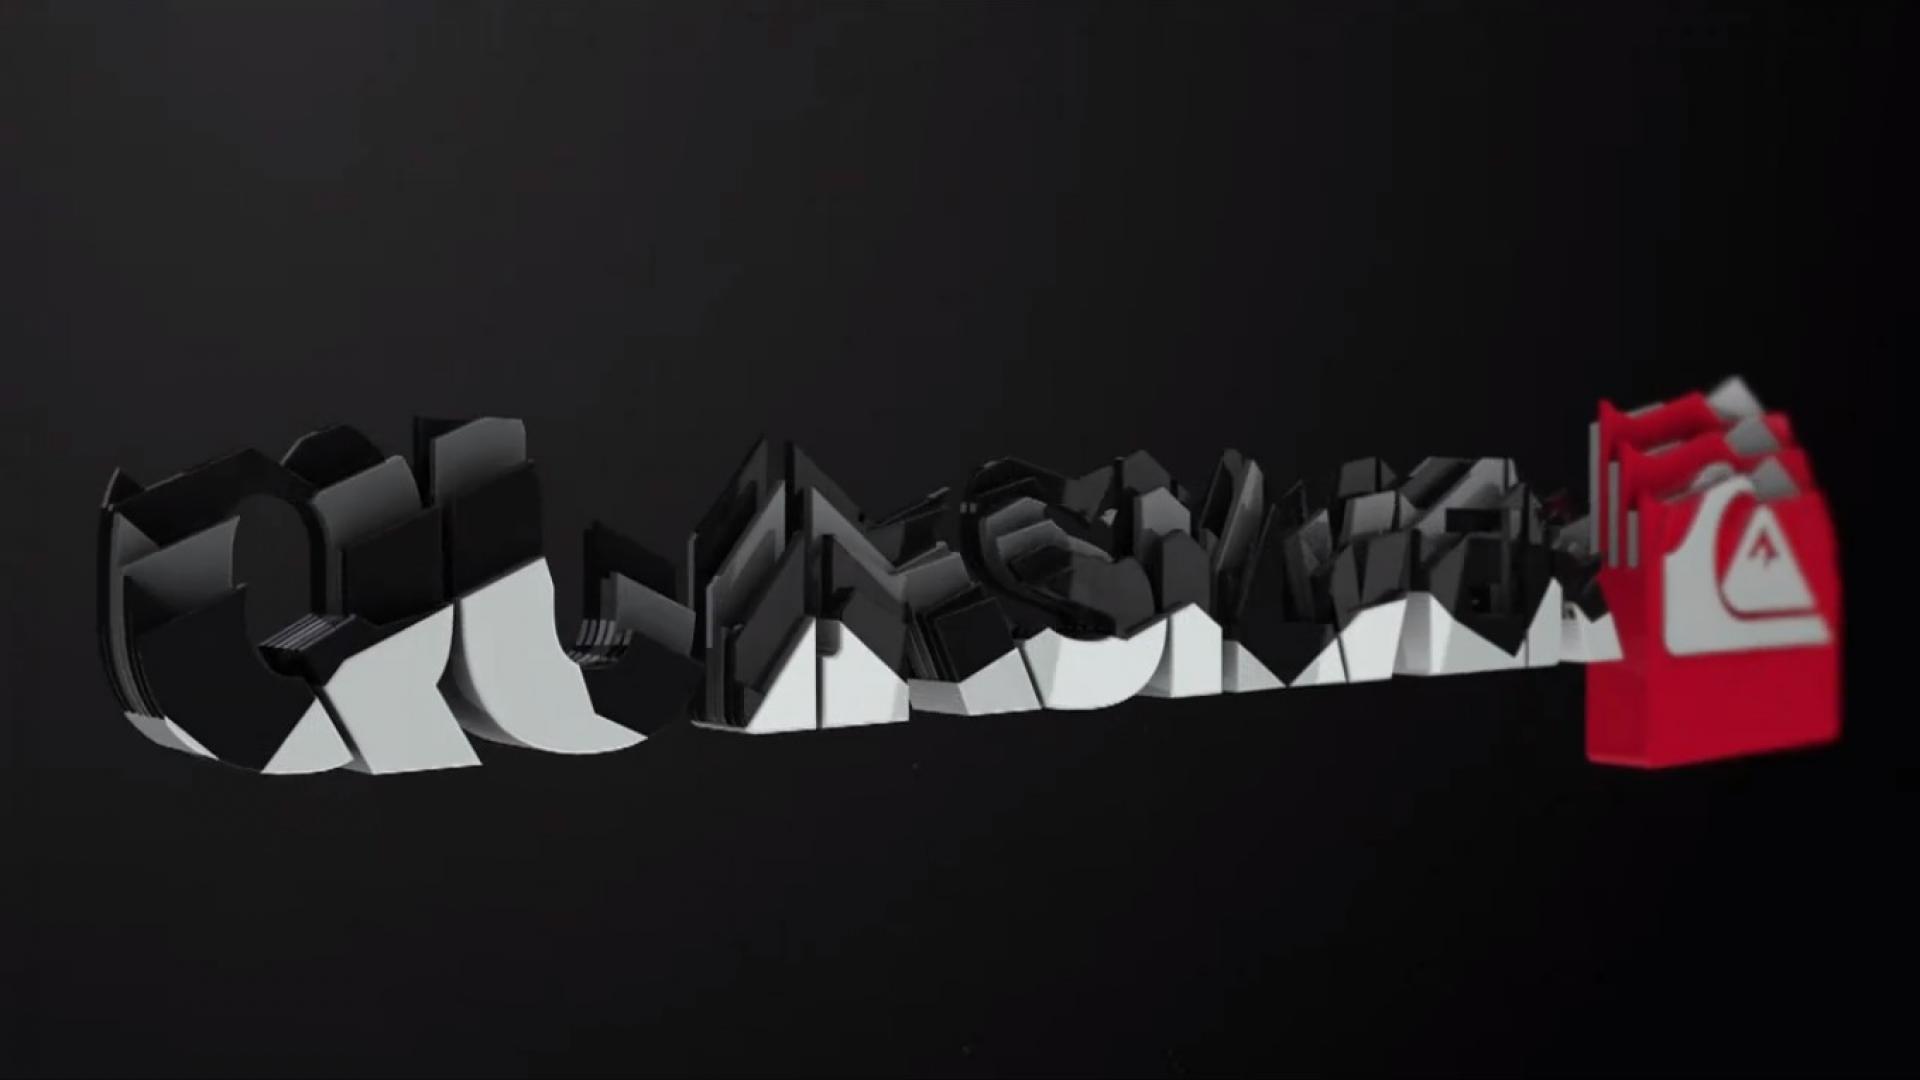 quiksilver logo wallpapers wallpaper cave